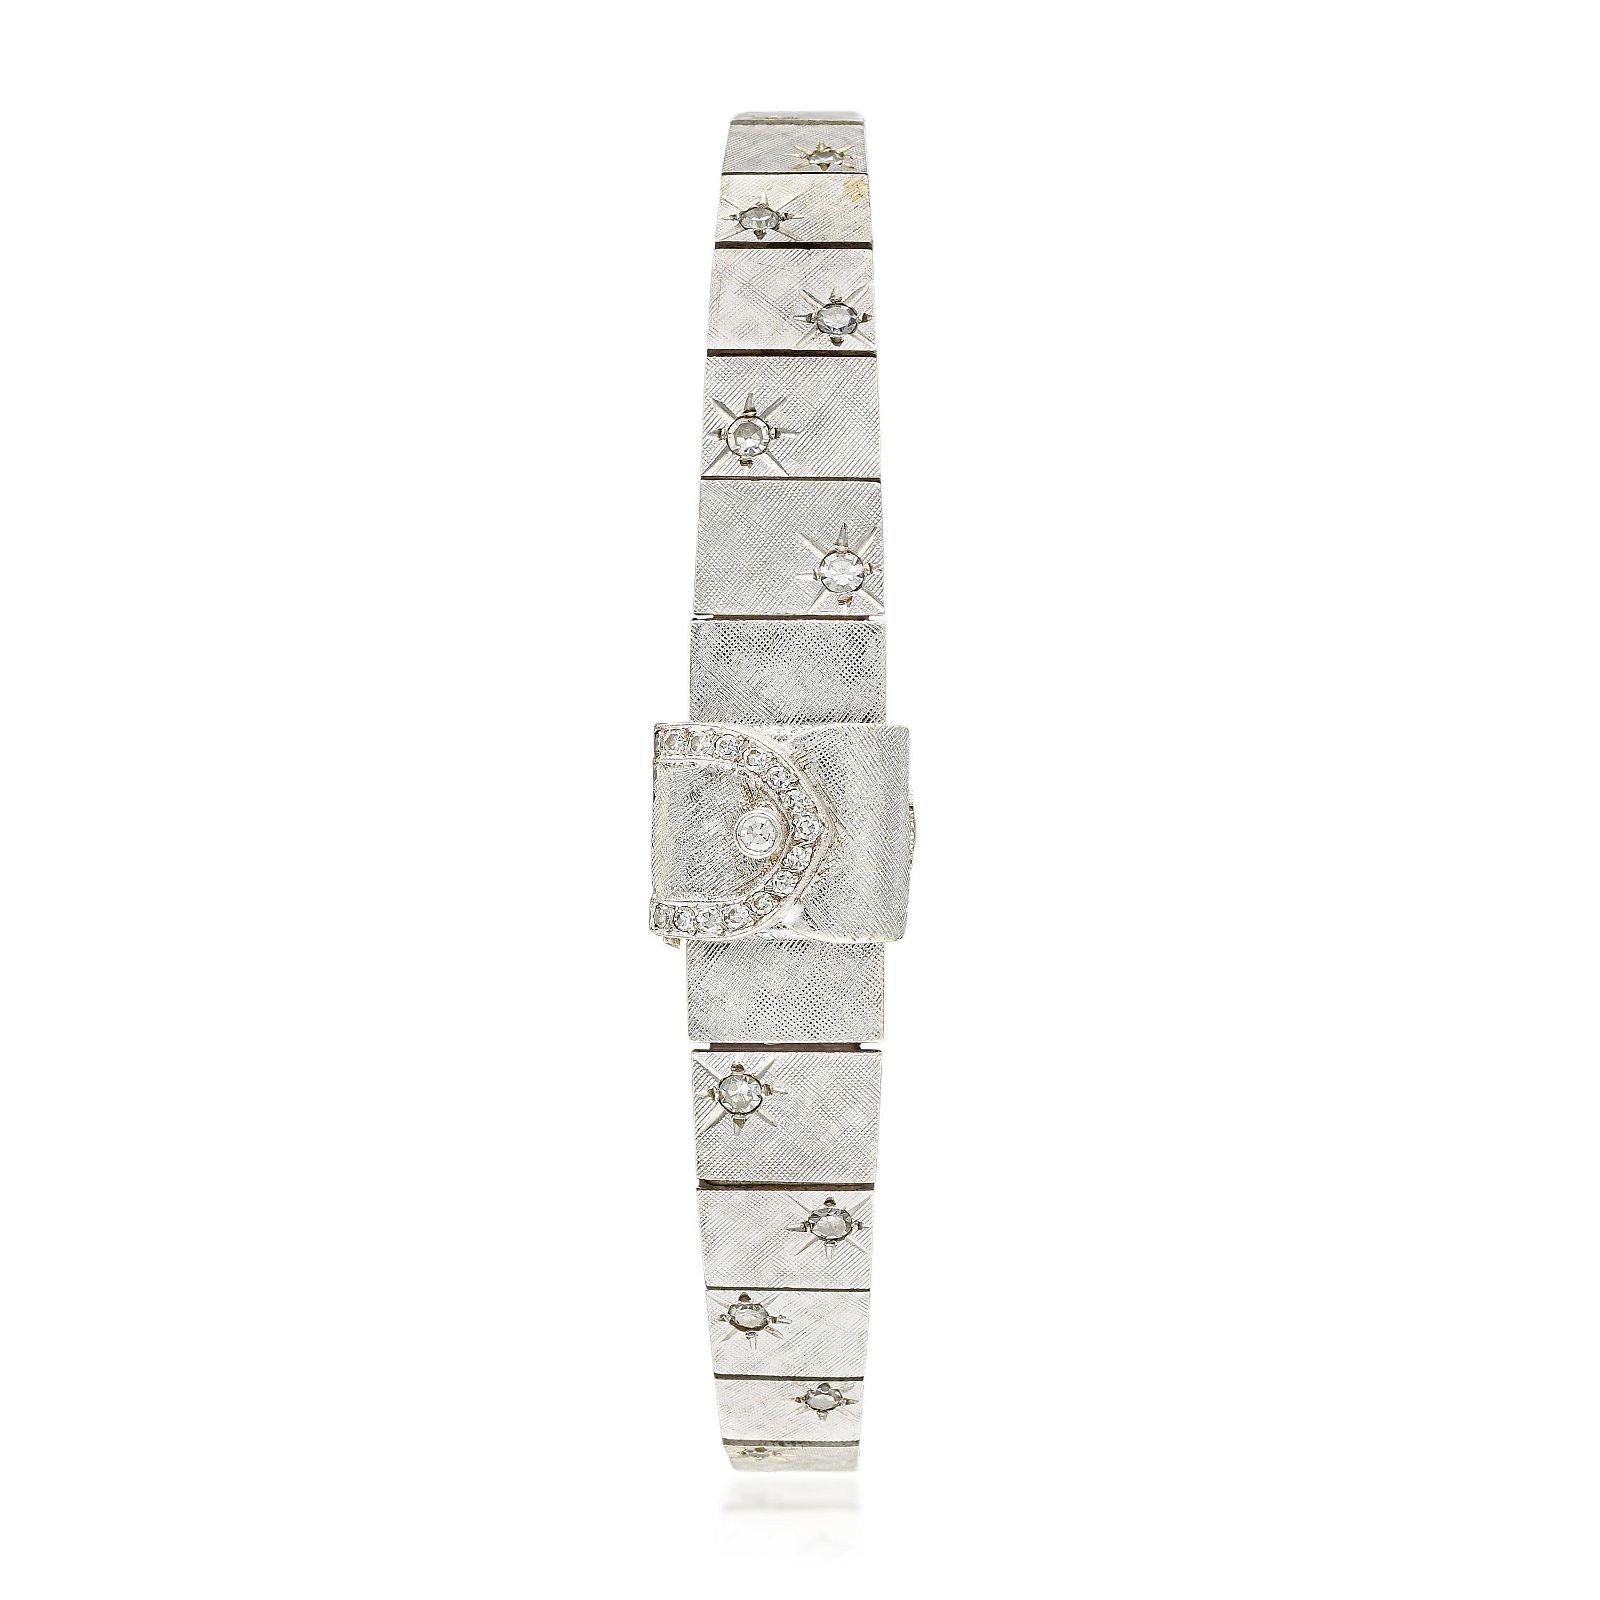 La Femme Concealed Watch Bracelet in 14K White Gold